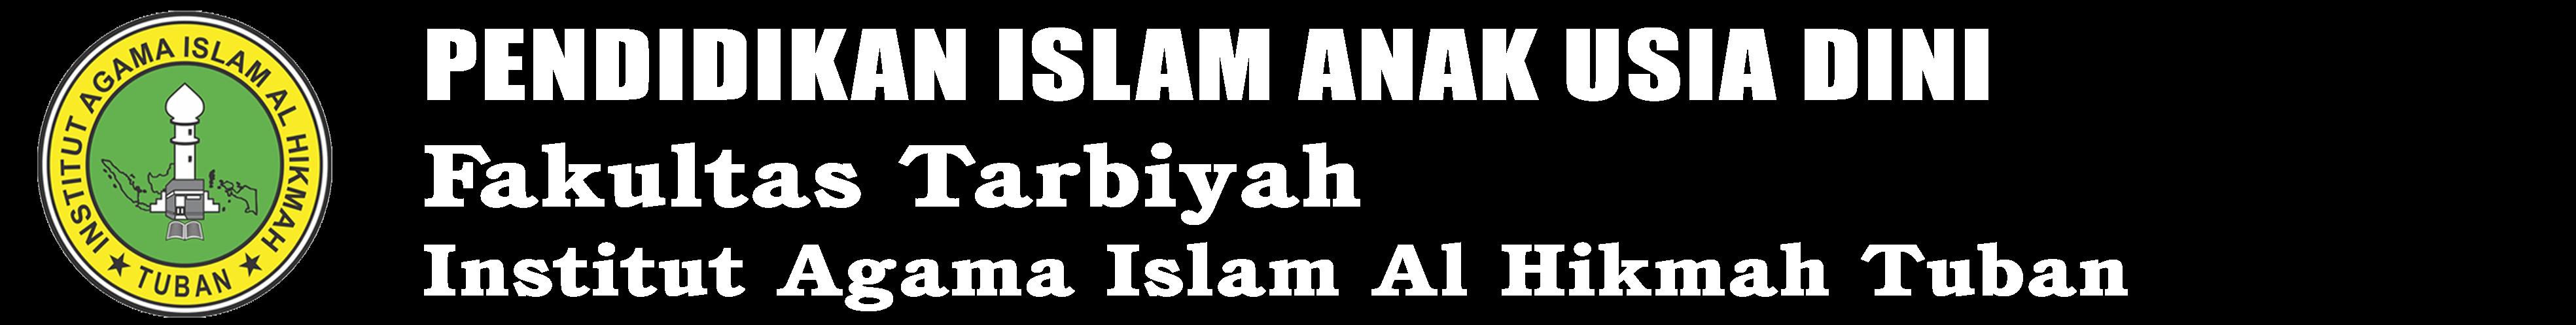 PIAUD IAI Al Hikmah Tuban